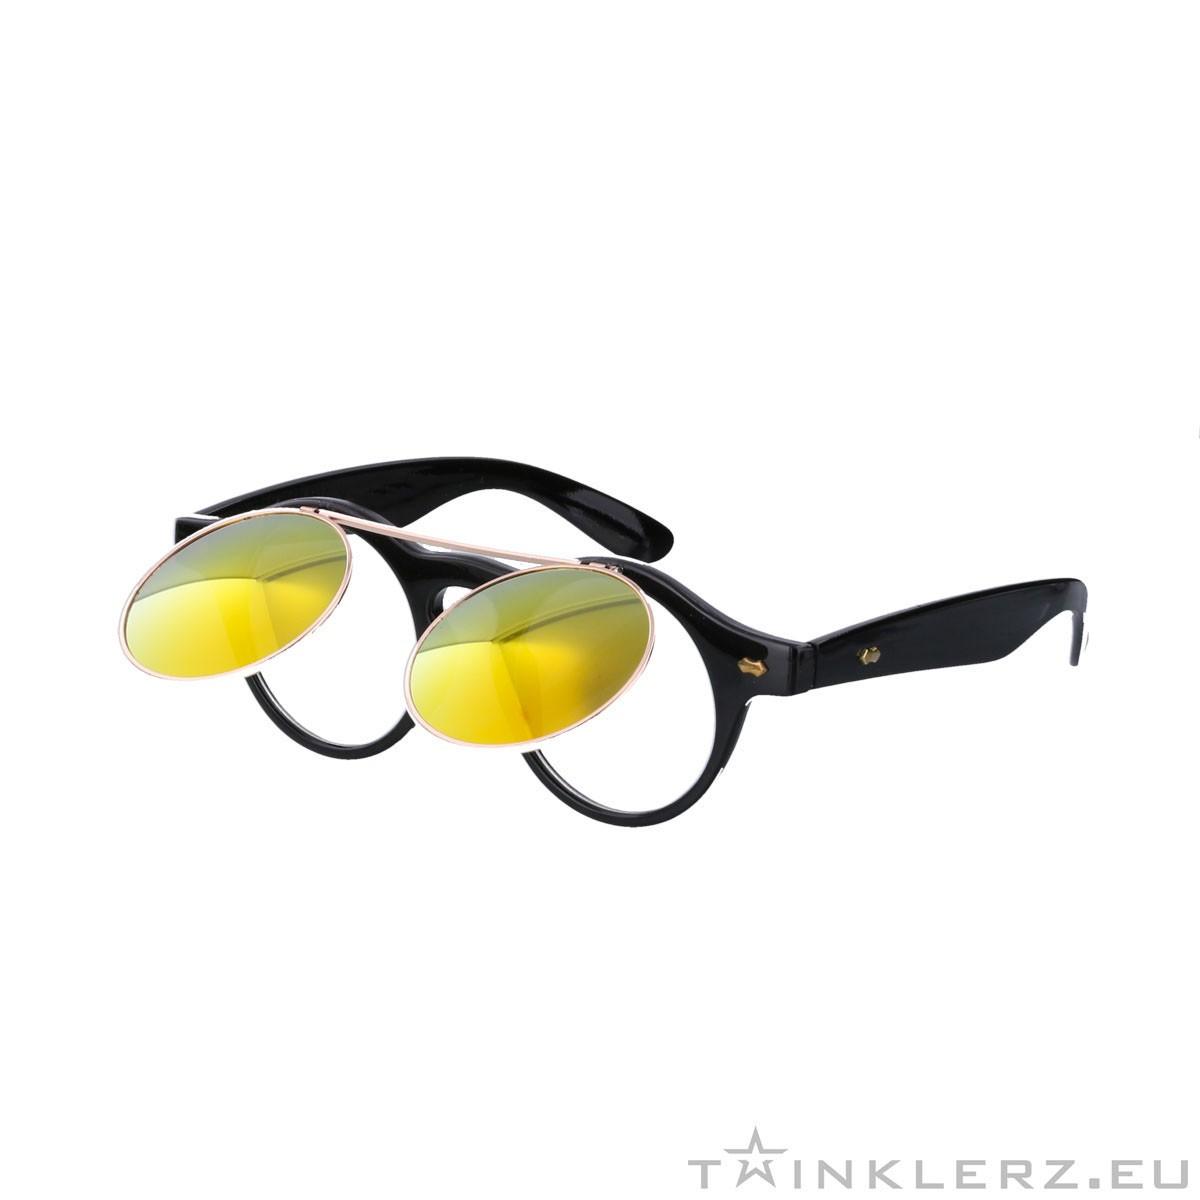 Black retro sunglasses -  flip and red orange mirror glass